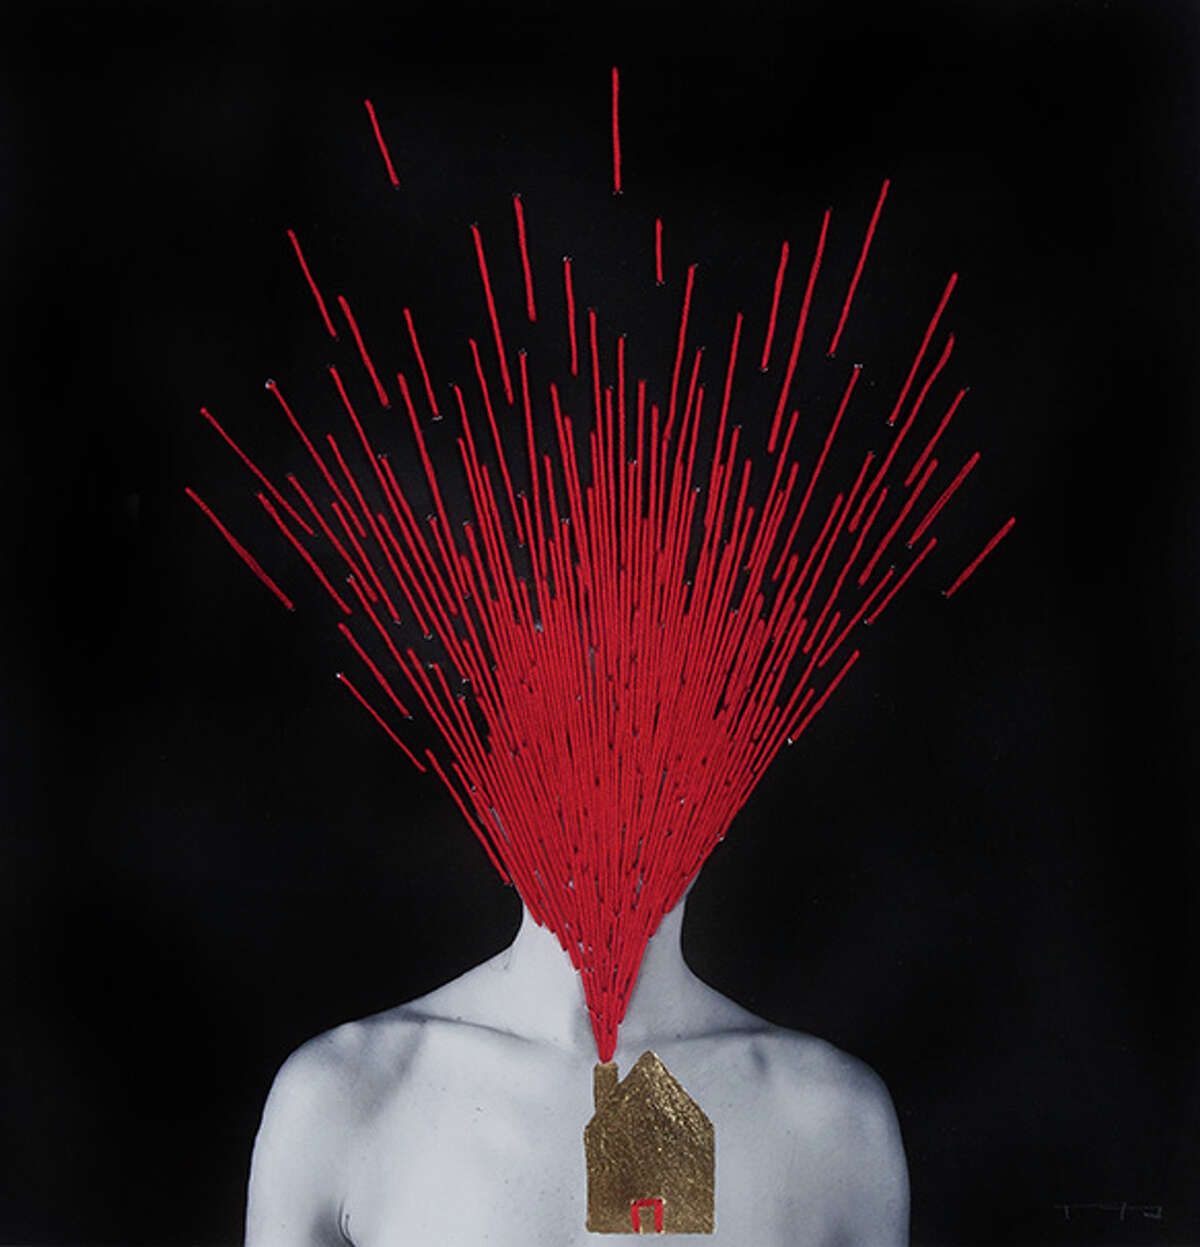 'Mental Maps' by Marina Font